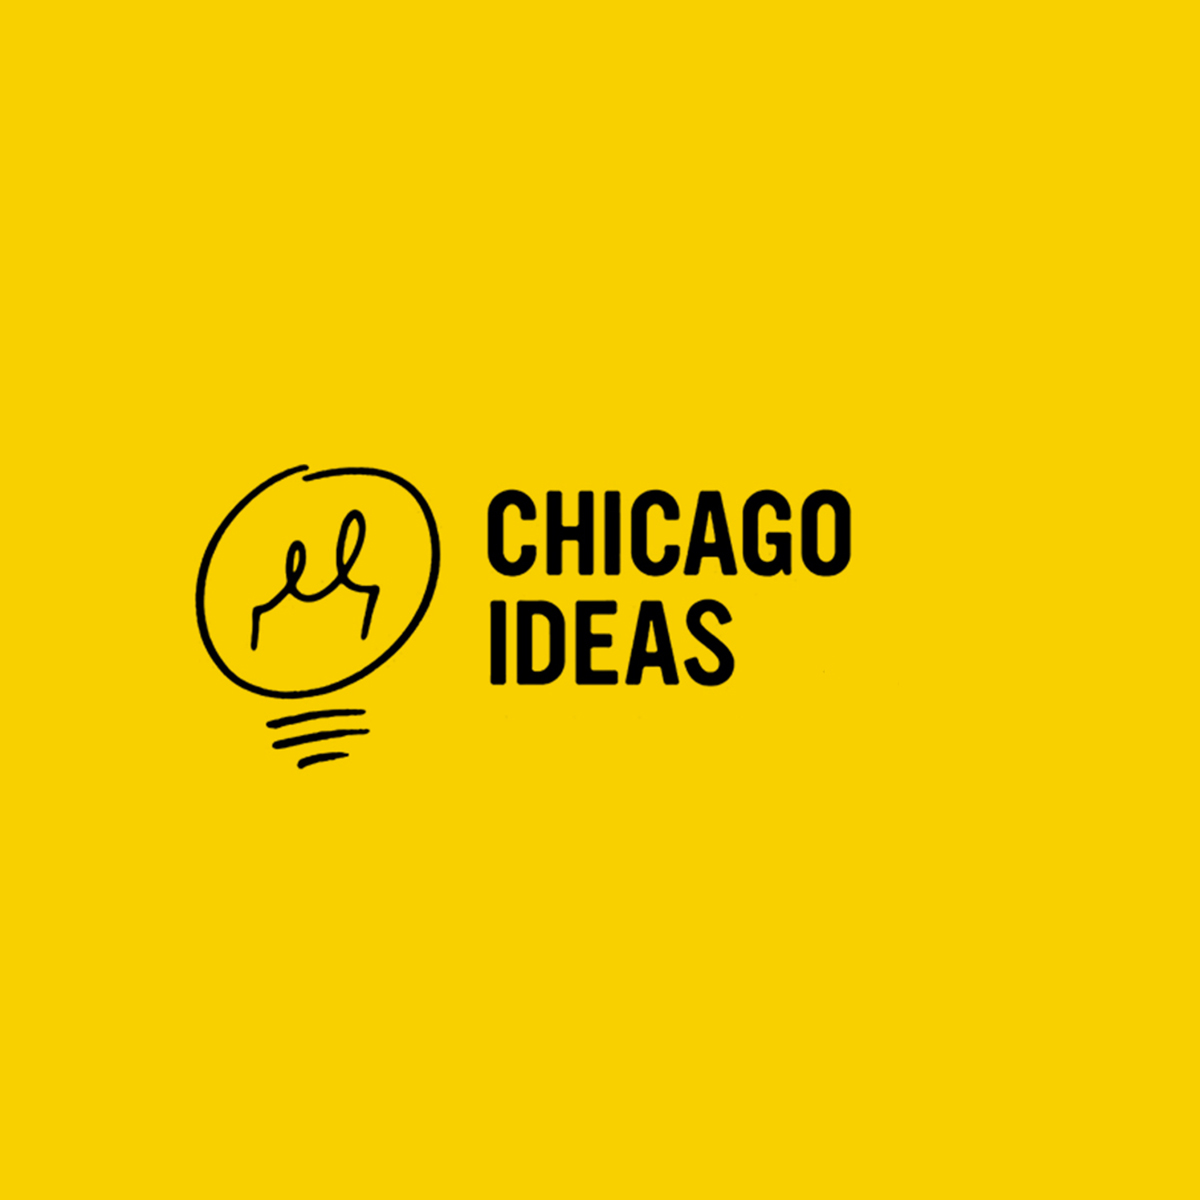 ChicagoIdeas.jpg